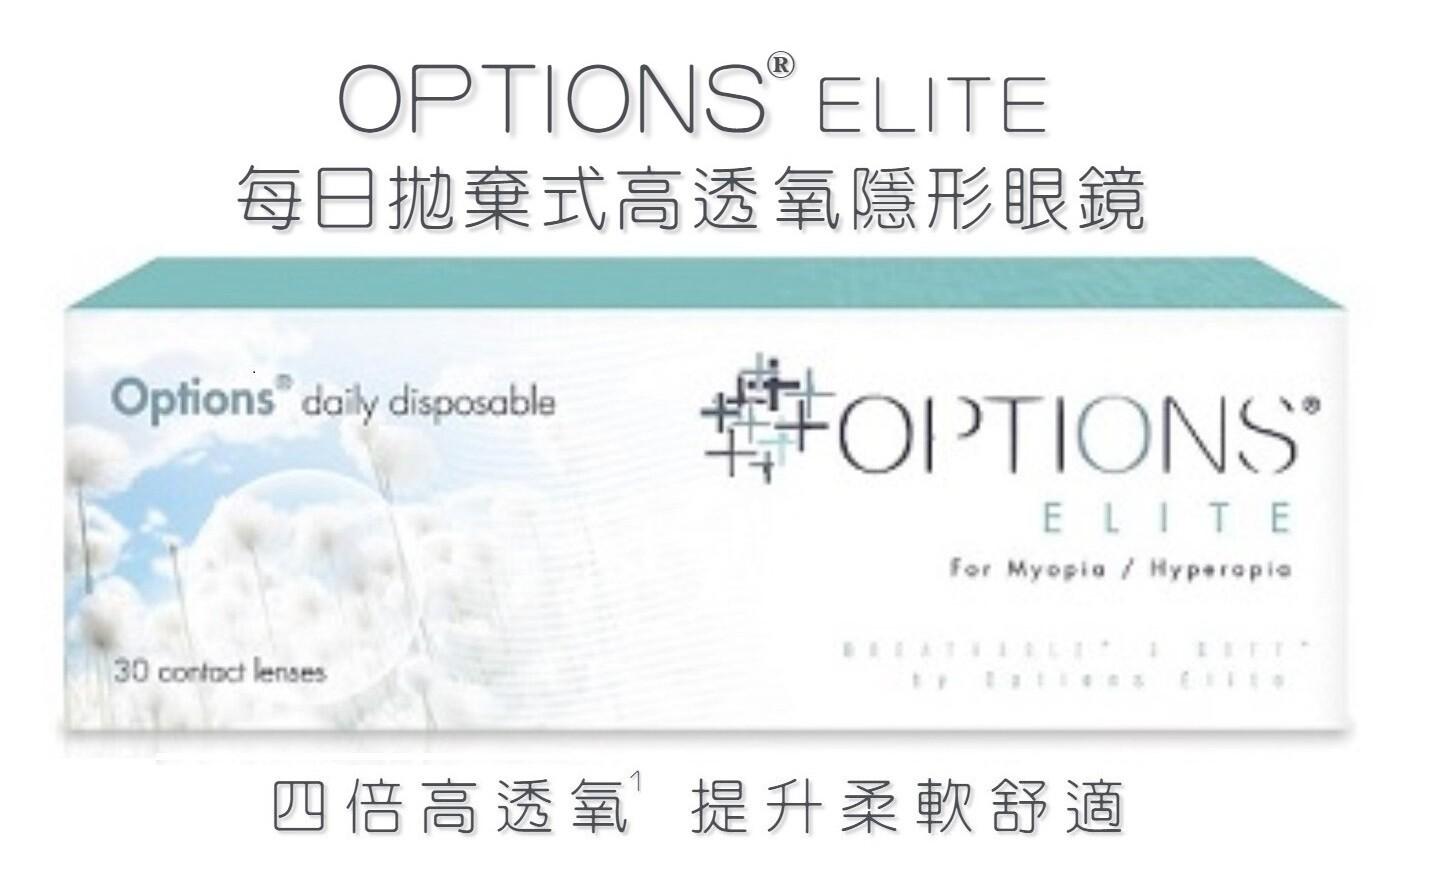 Options Elite 1 Day Contact lens 30pcs/box 每日拋棄式高透氧隱形眼鏡 每盒30片